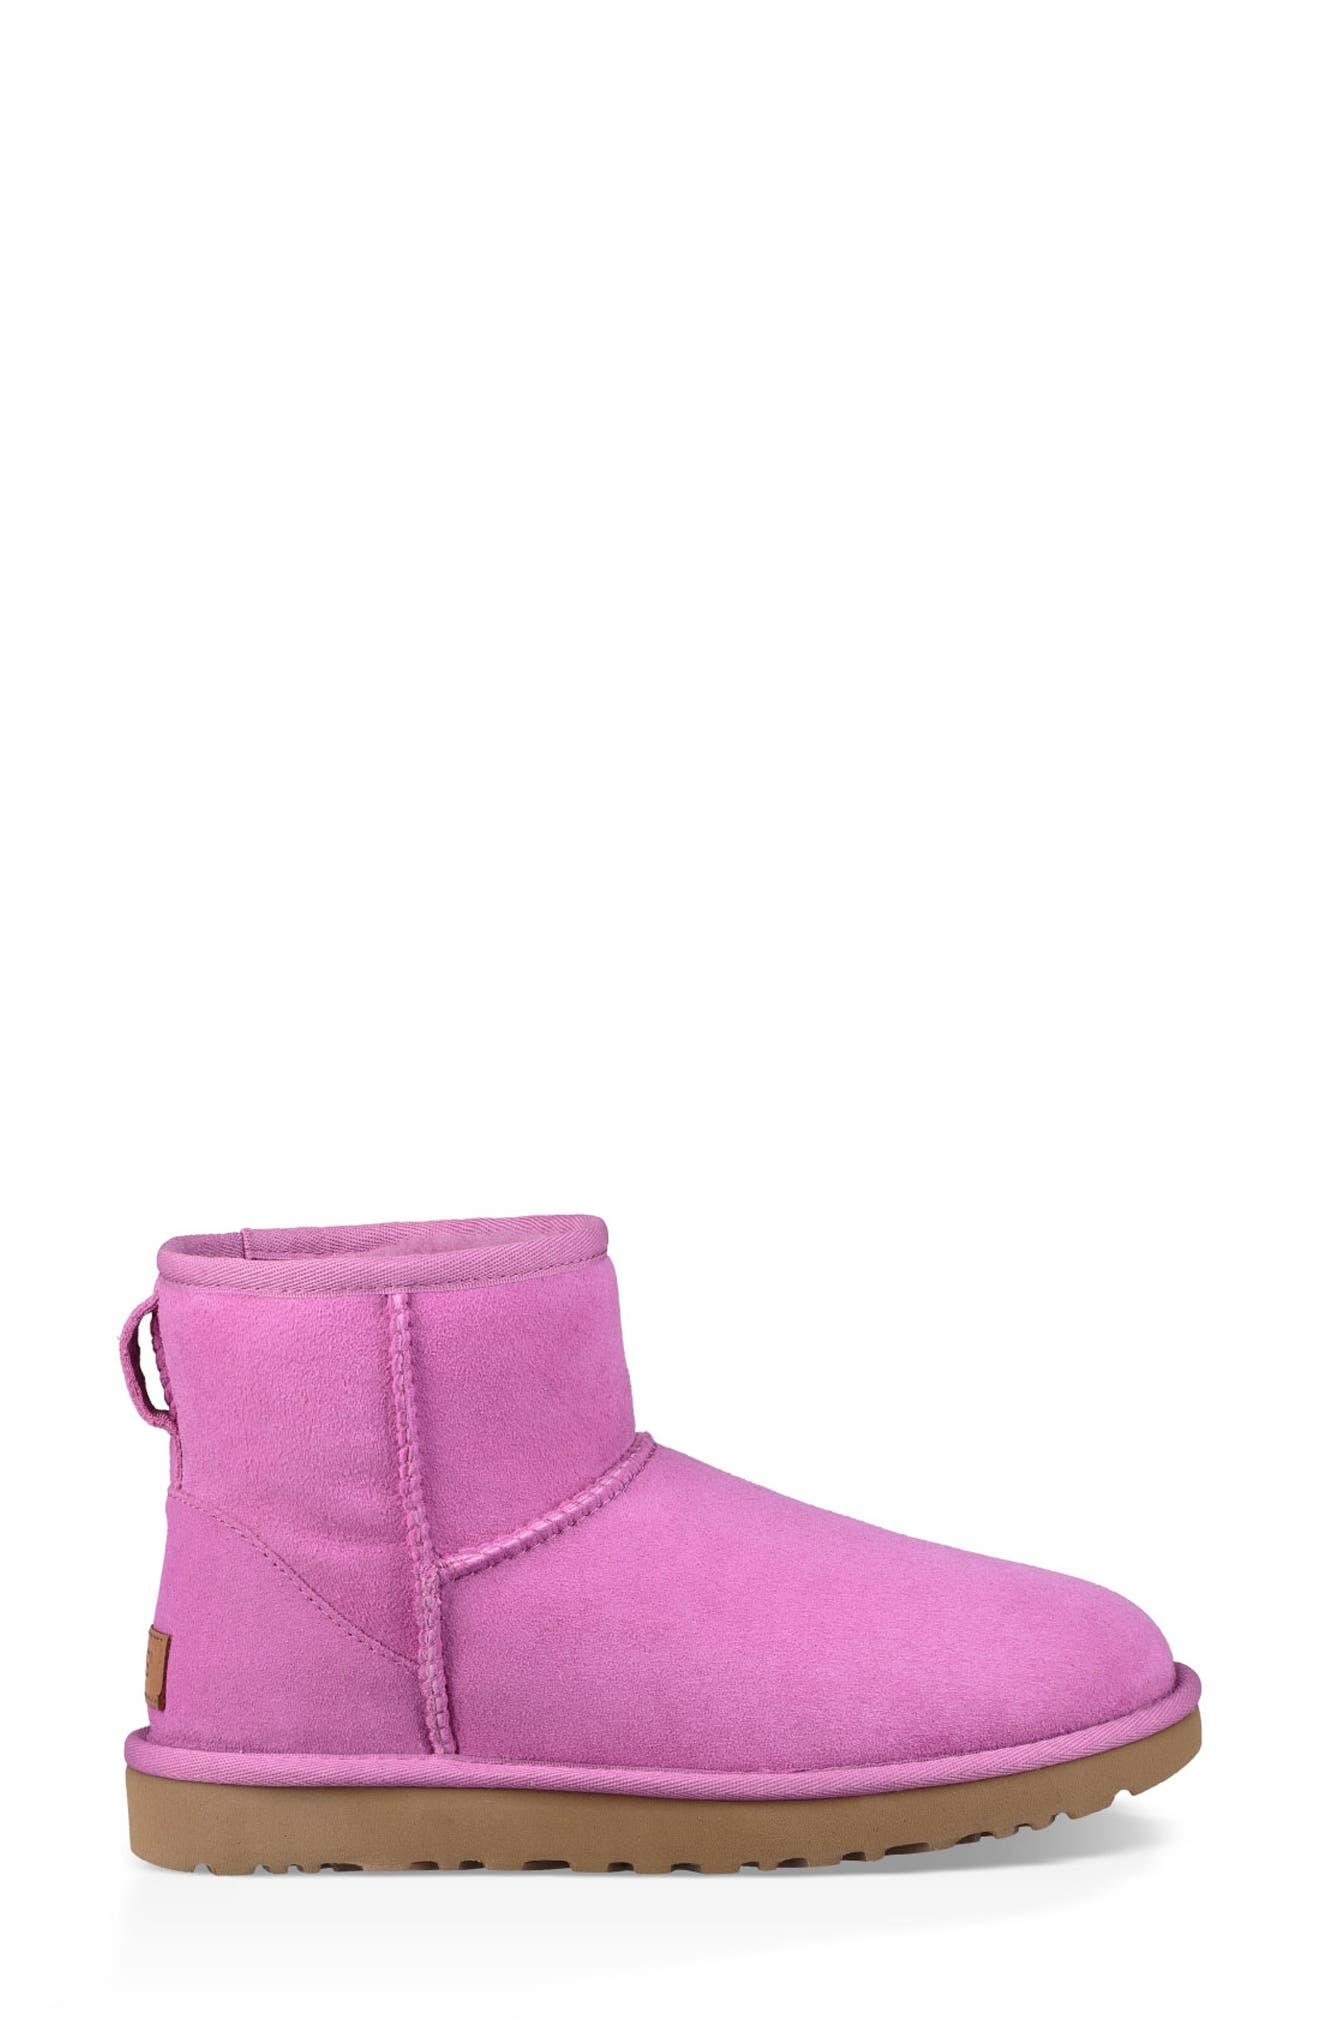 ,                             Classic Mini II Genuine Shearling Lined Boot,                             Alternate thumbnail 49, color,                             528